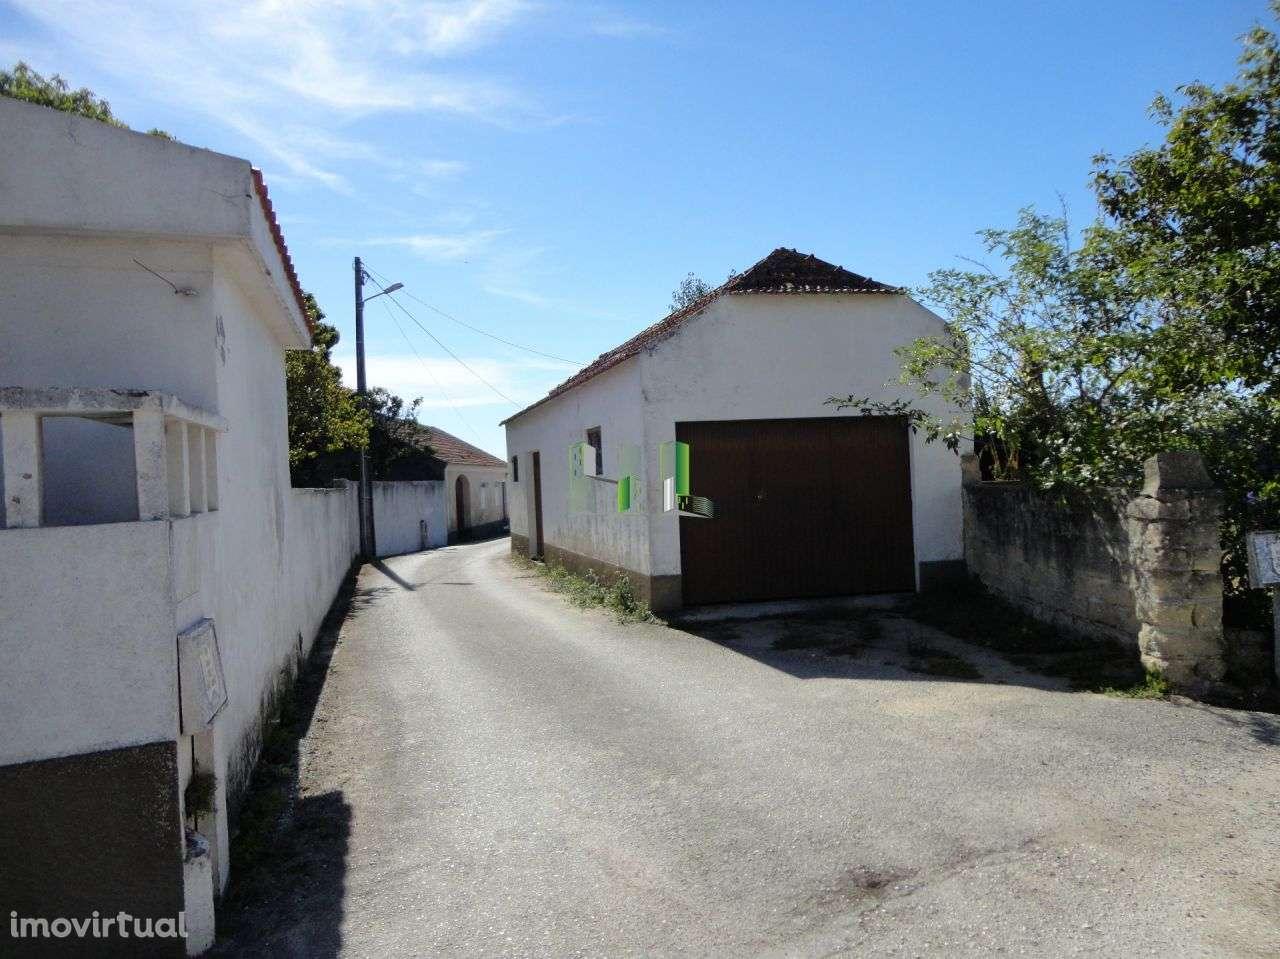 Moradia para comprar, Louriçal, Pombal, Leiria - Foto 20